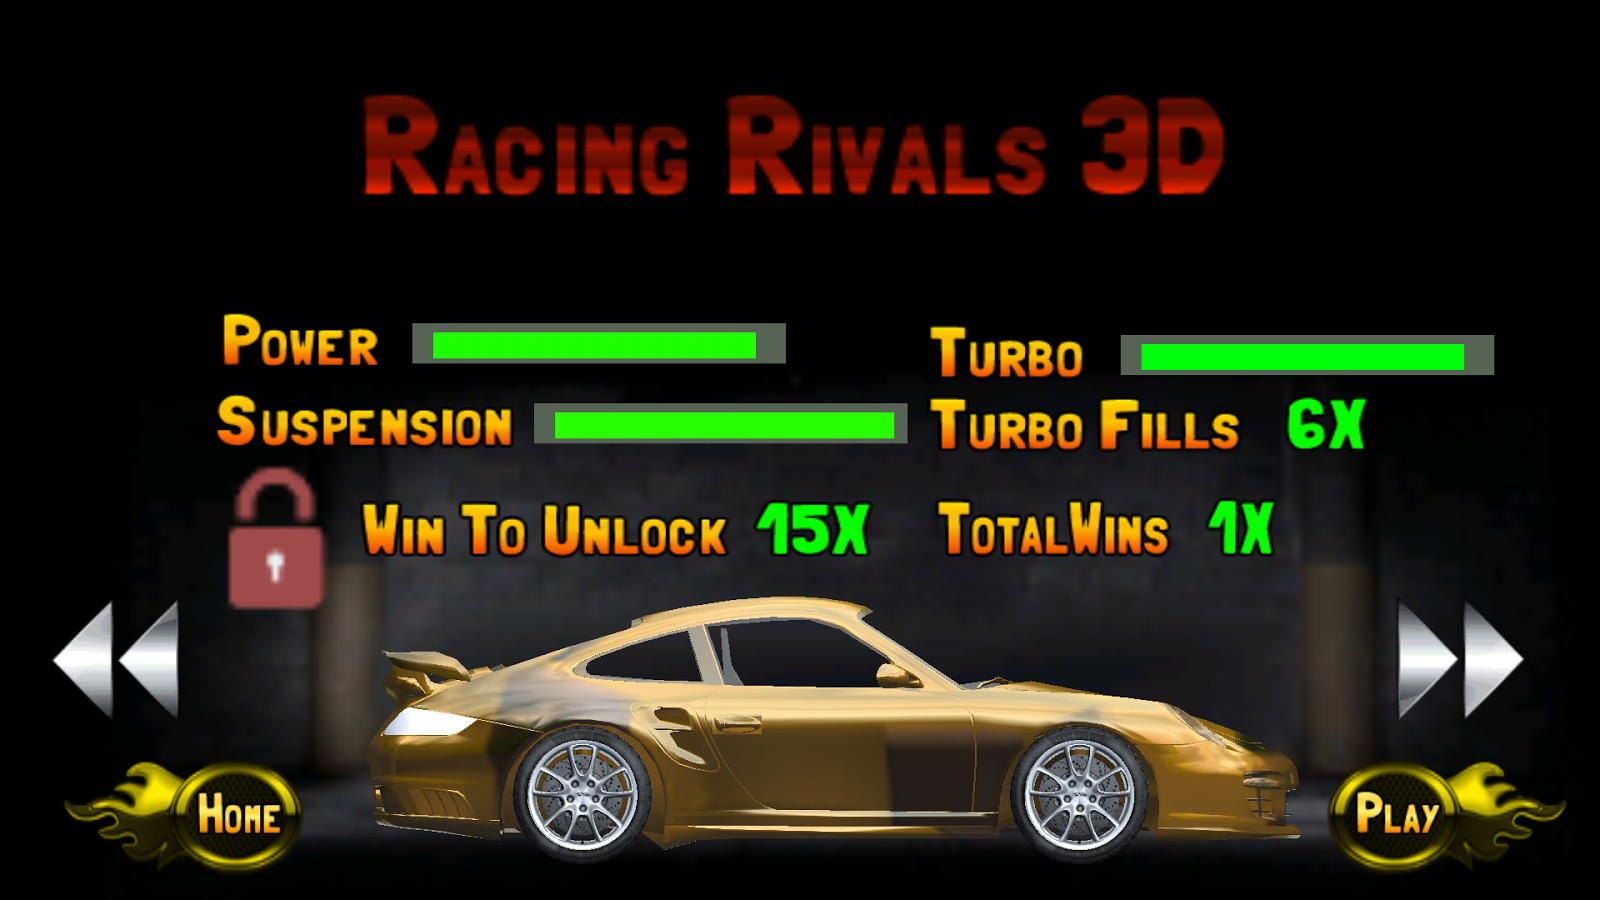 Racing rivals 3d extreme race screenshot